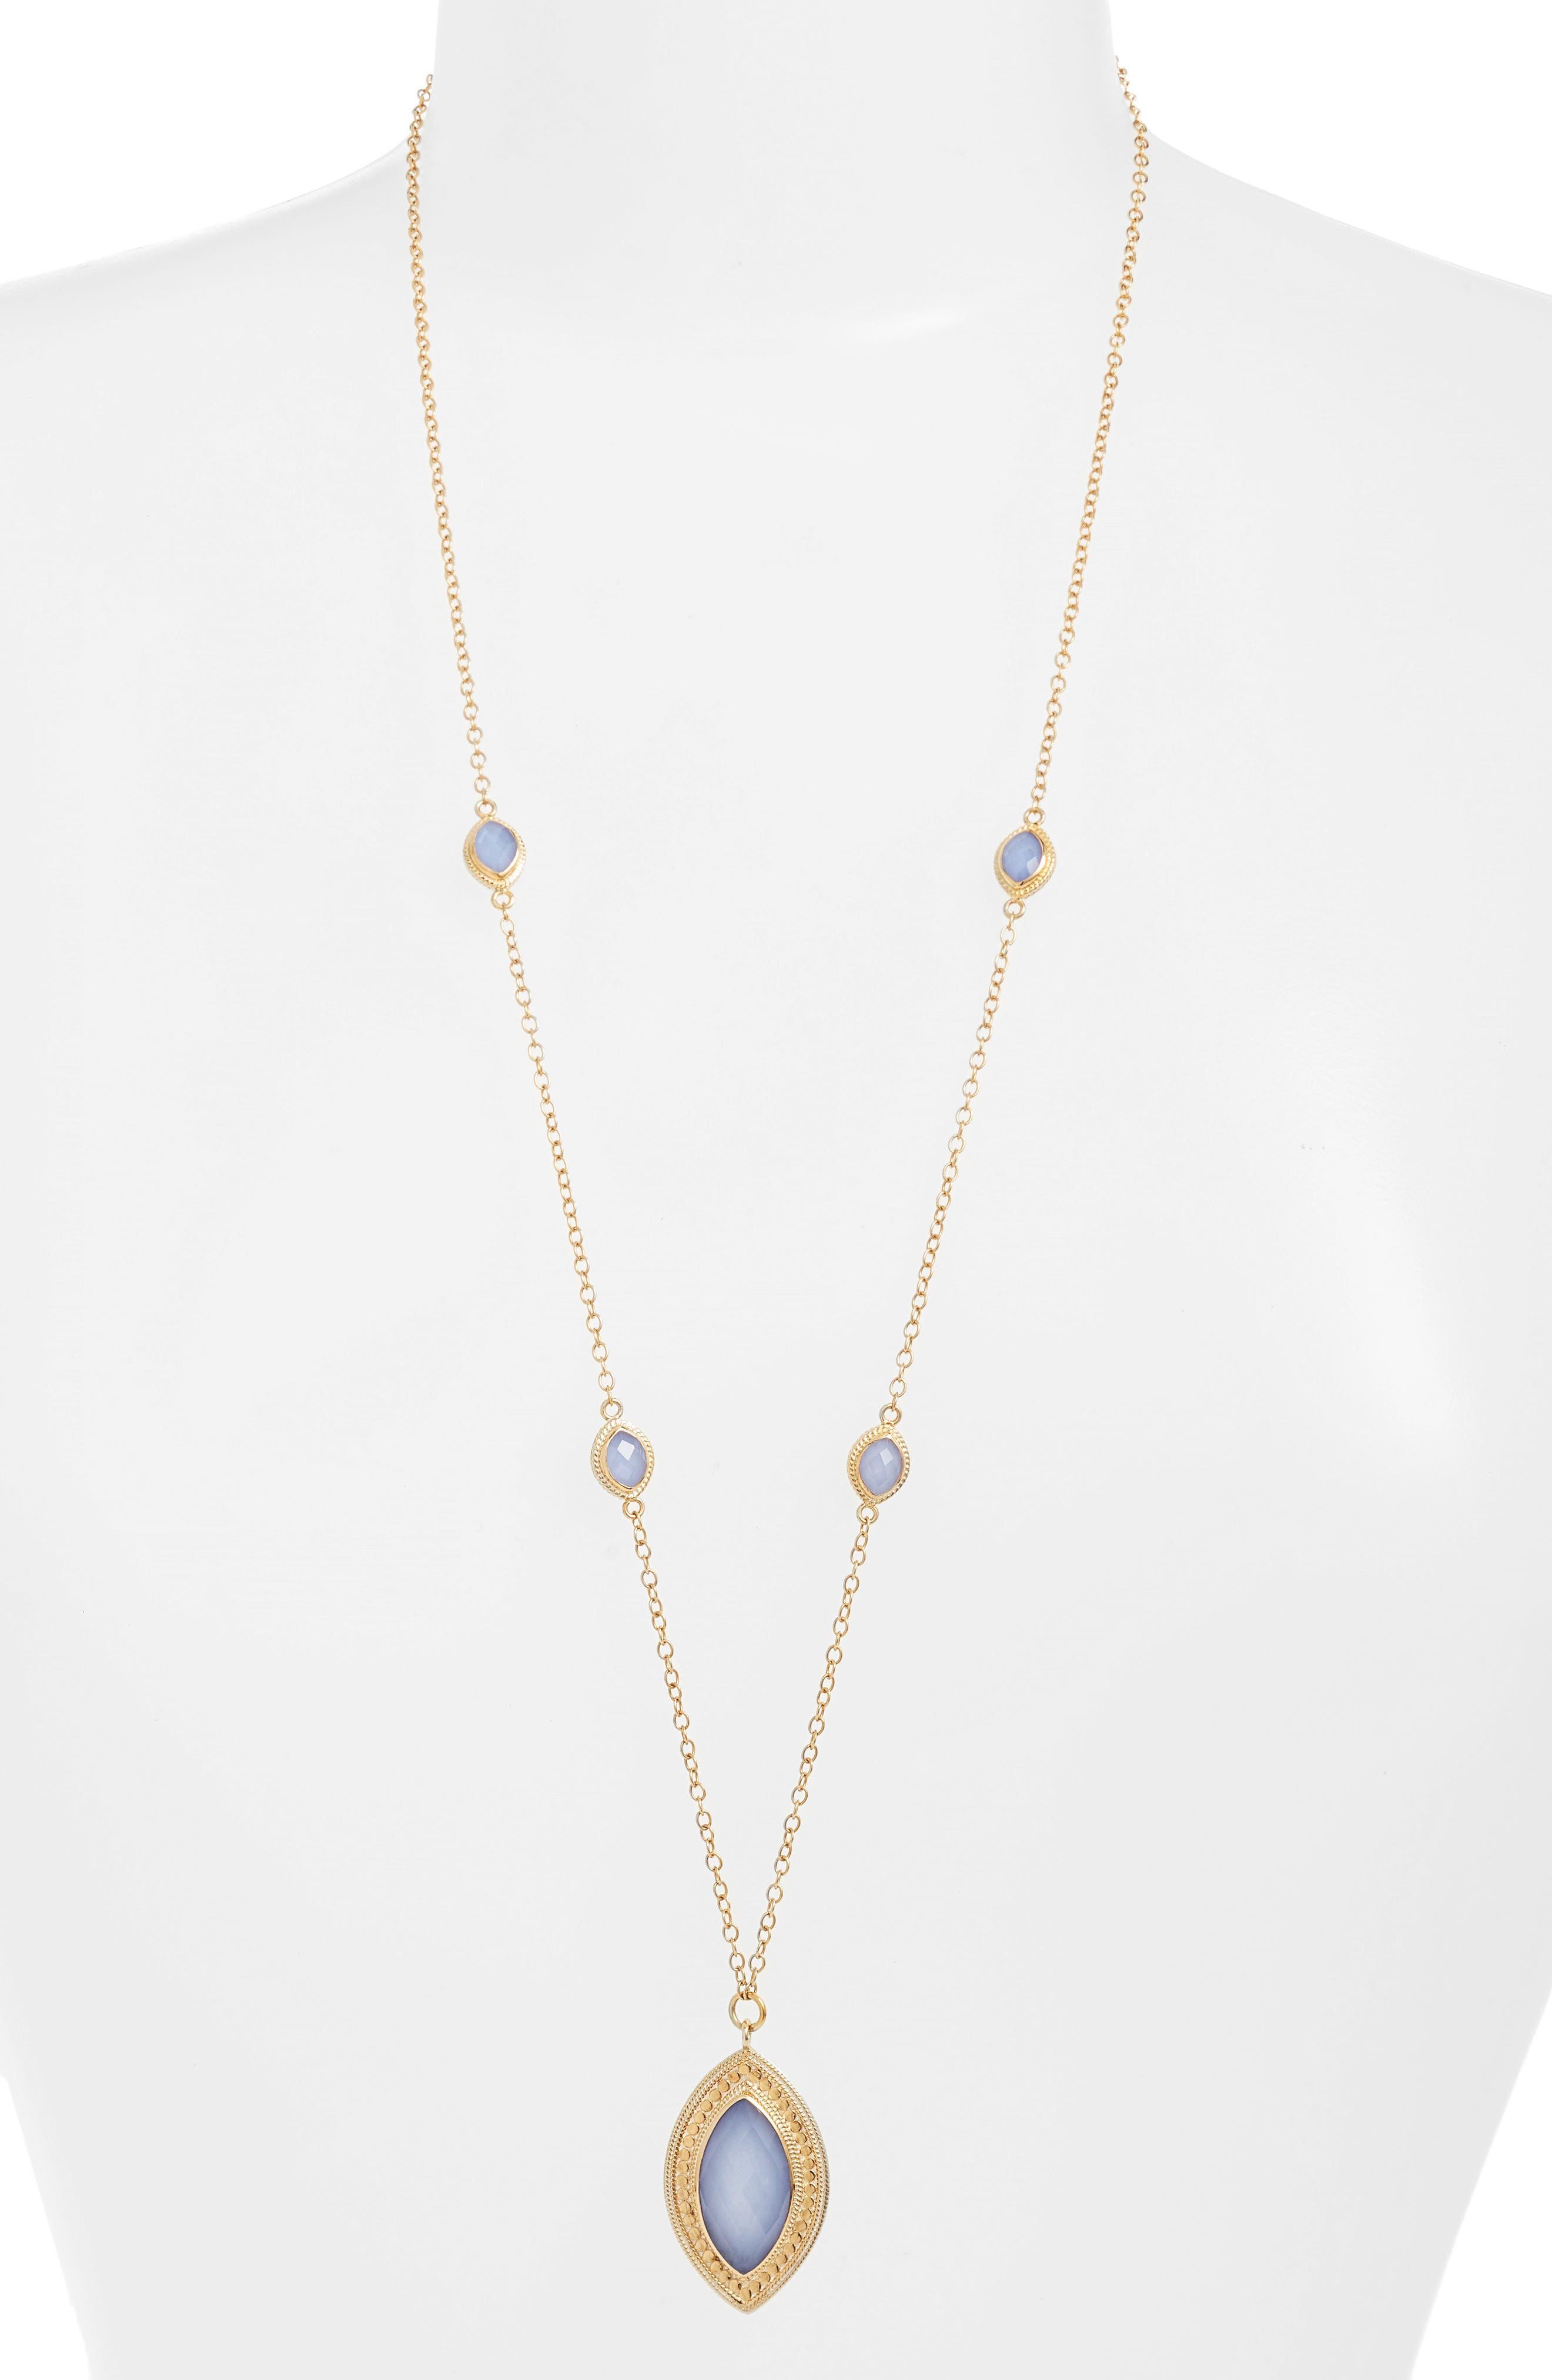 Semiprecious Stone Pendant Necklace,                             Main thumbnail 1, color,                             Gold/ Blue Chalcedony